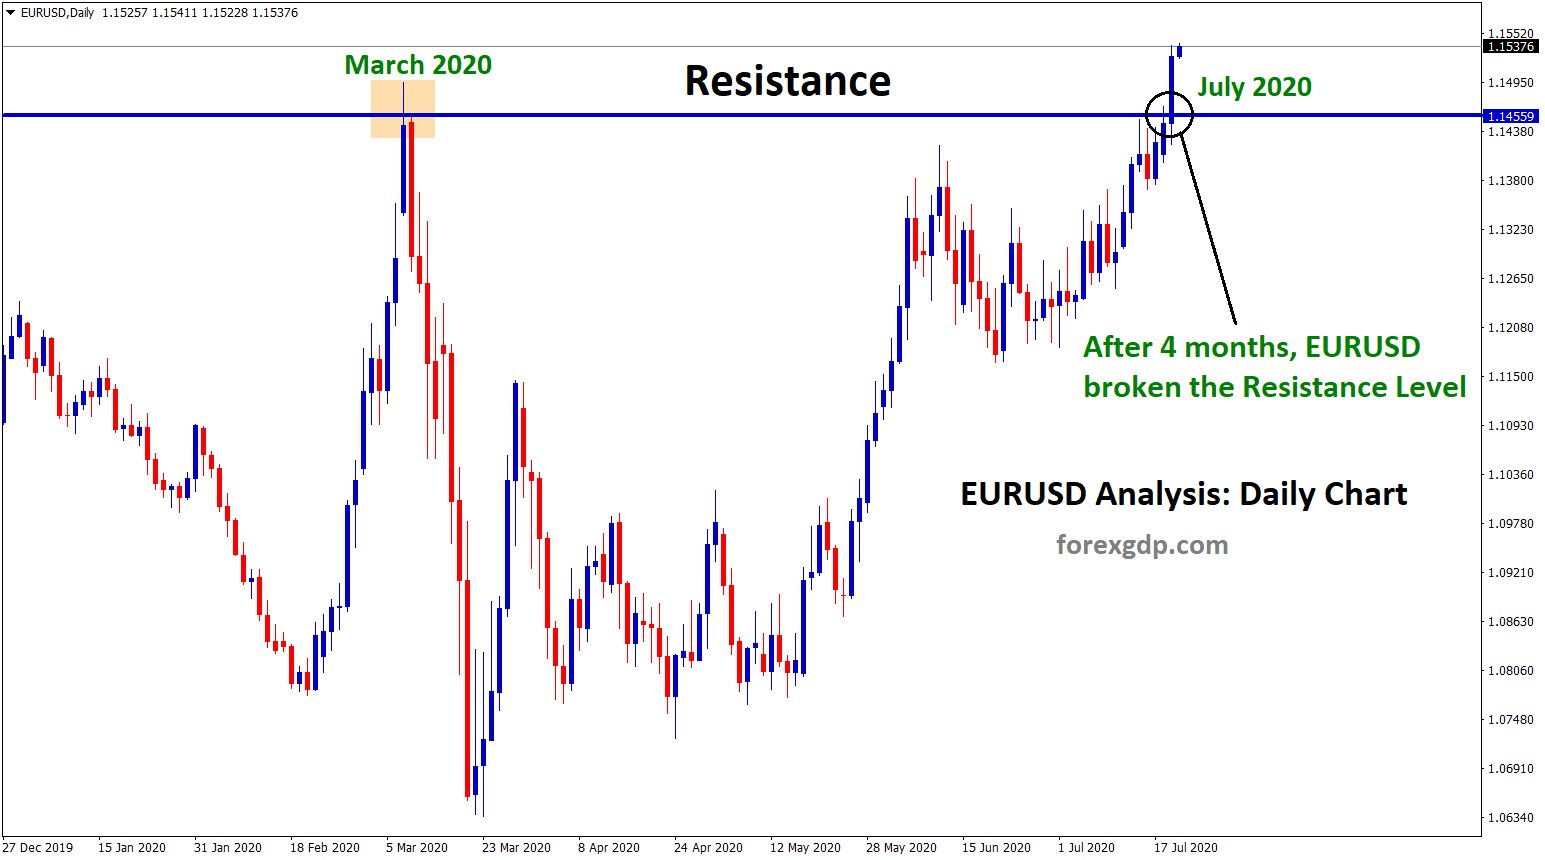 eurusd daily broken the resistance level